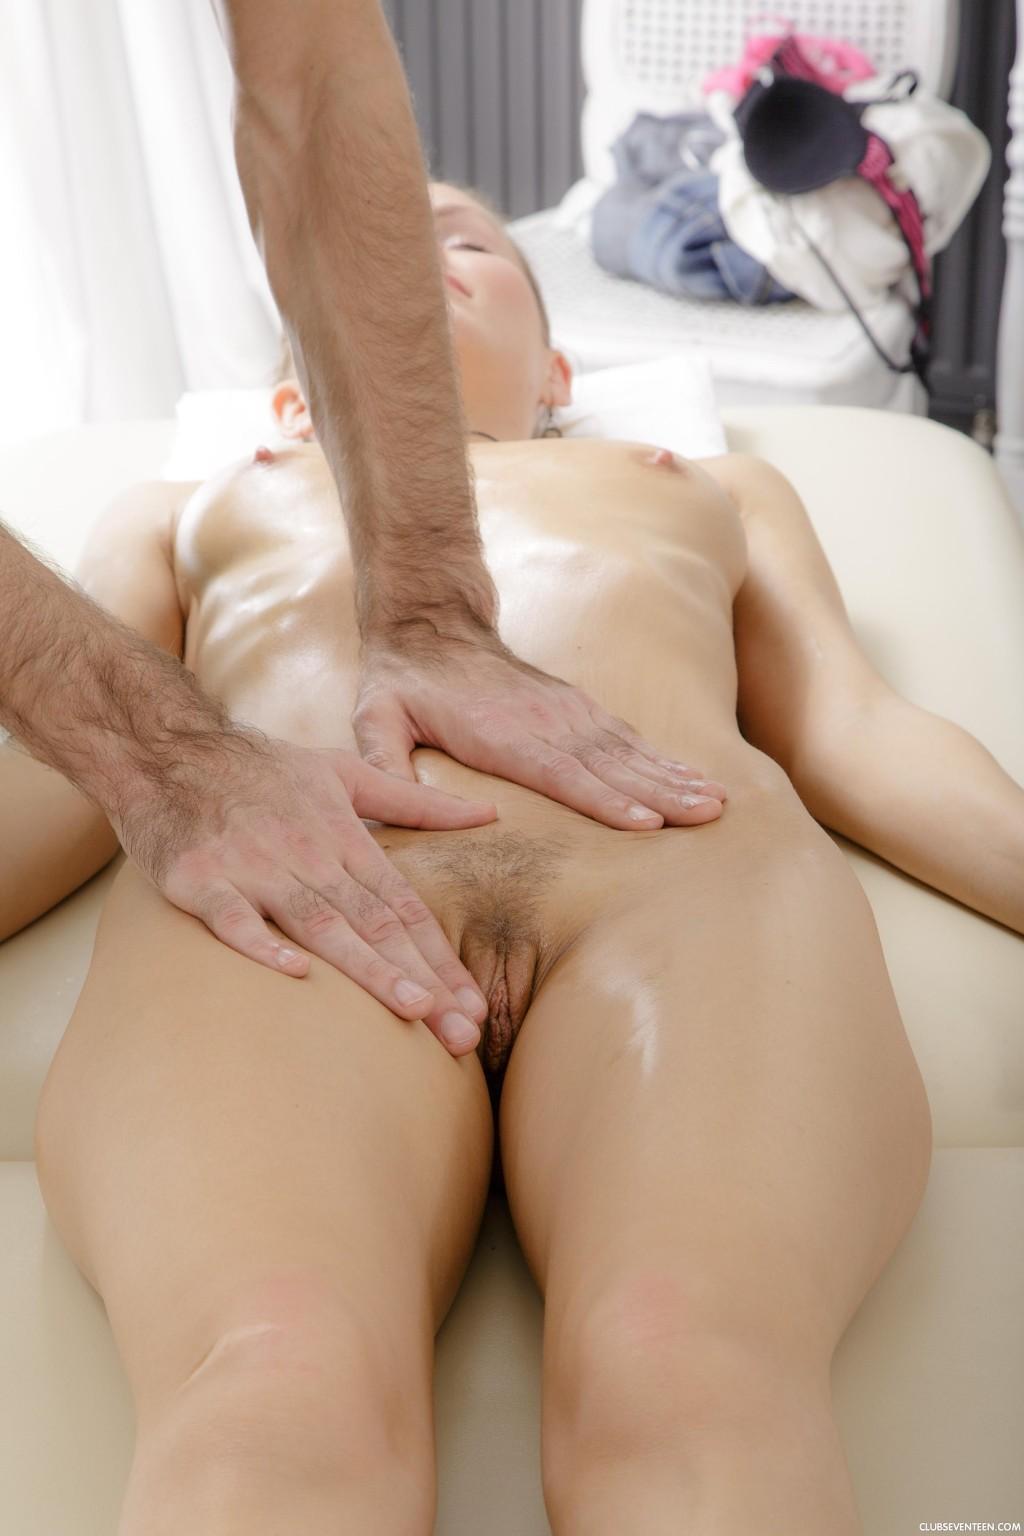 Group Massage Sex